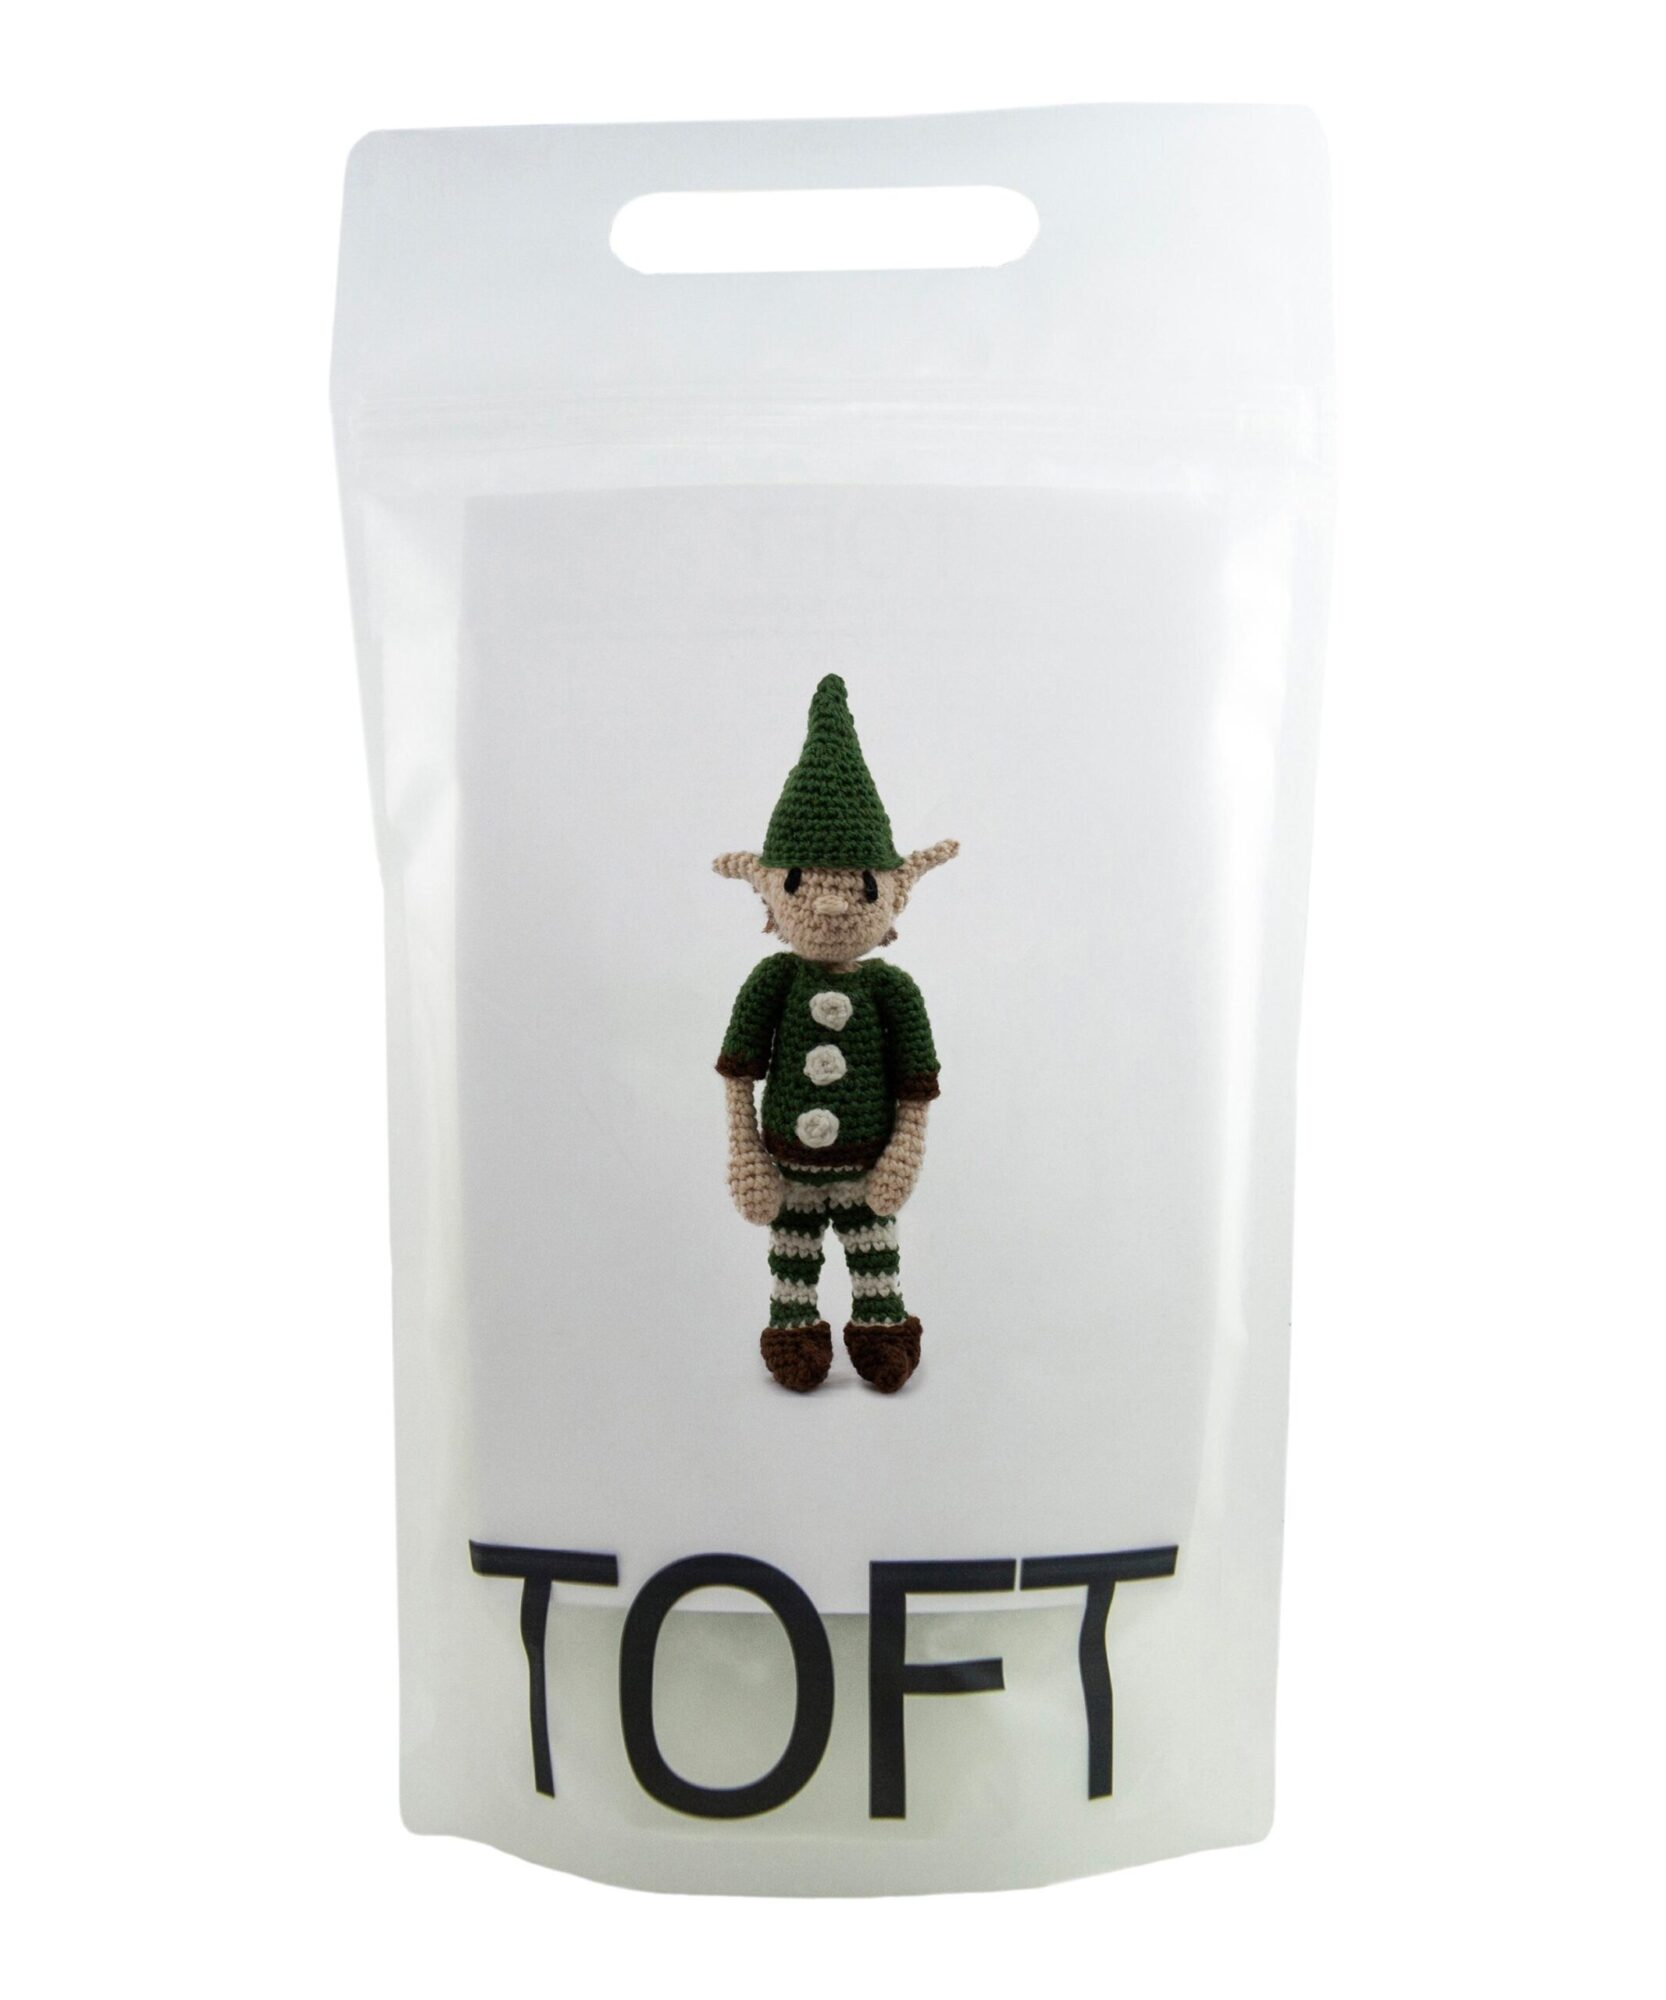 TOFT Elf Christmas Kit (Green) product image